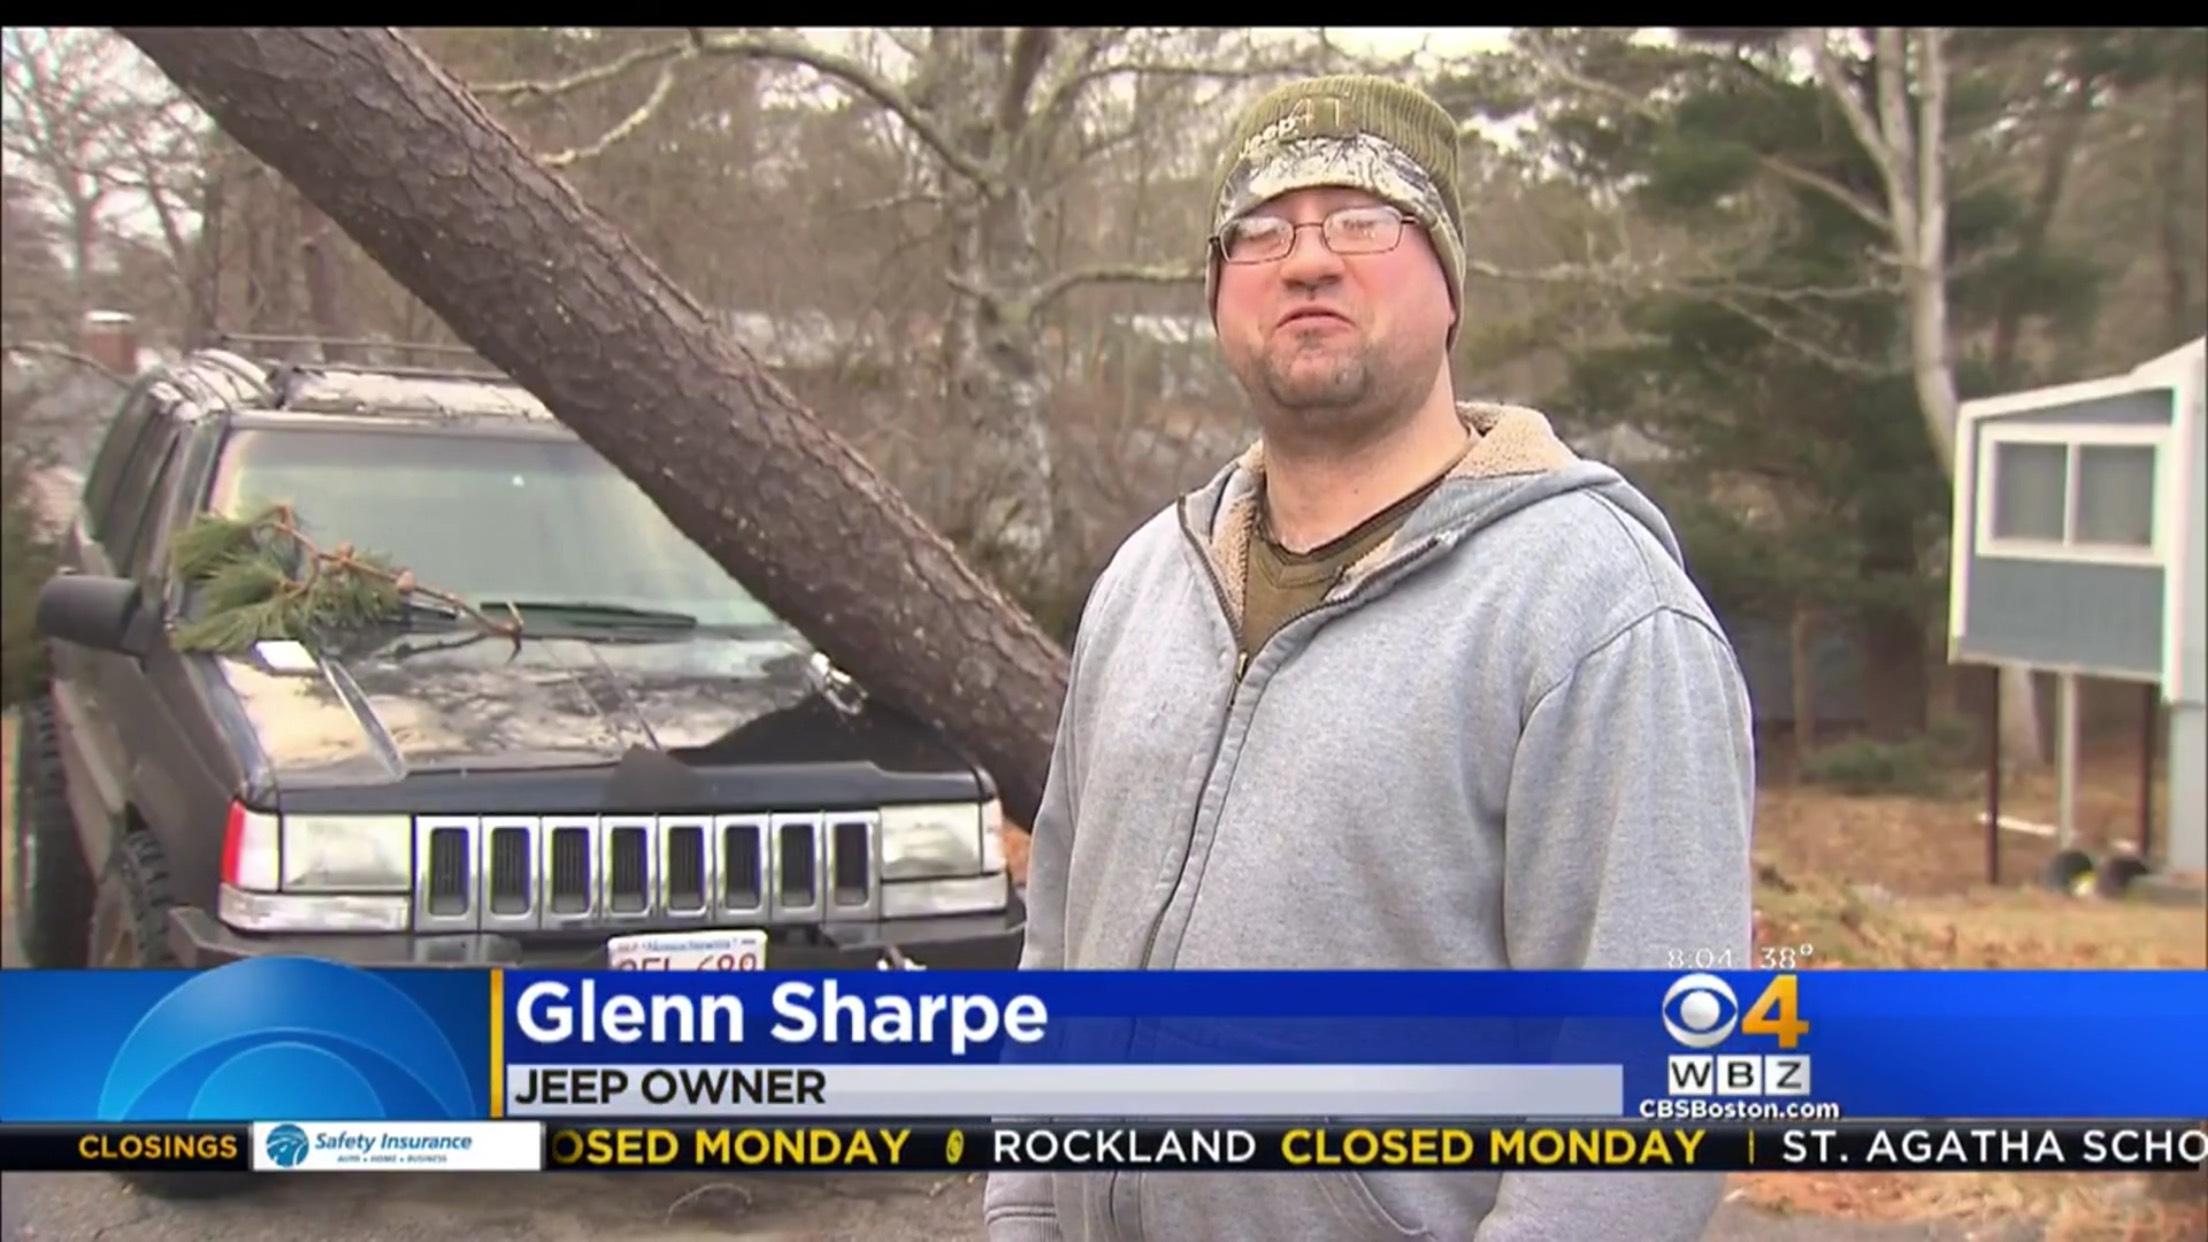 Glenn Sharpe: Jeep Owner. A tree has fallen onto Glenn's Jeep.